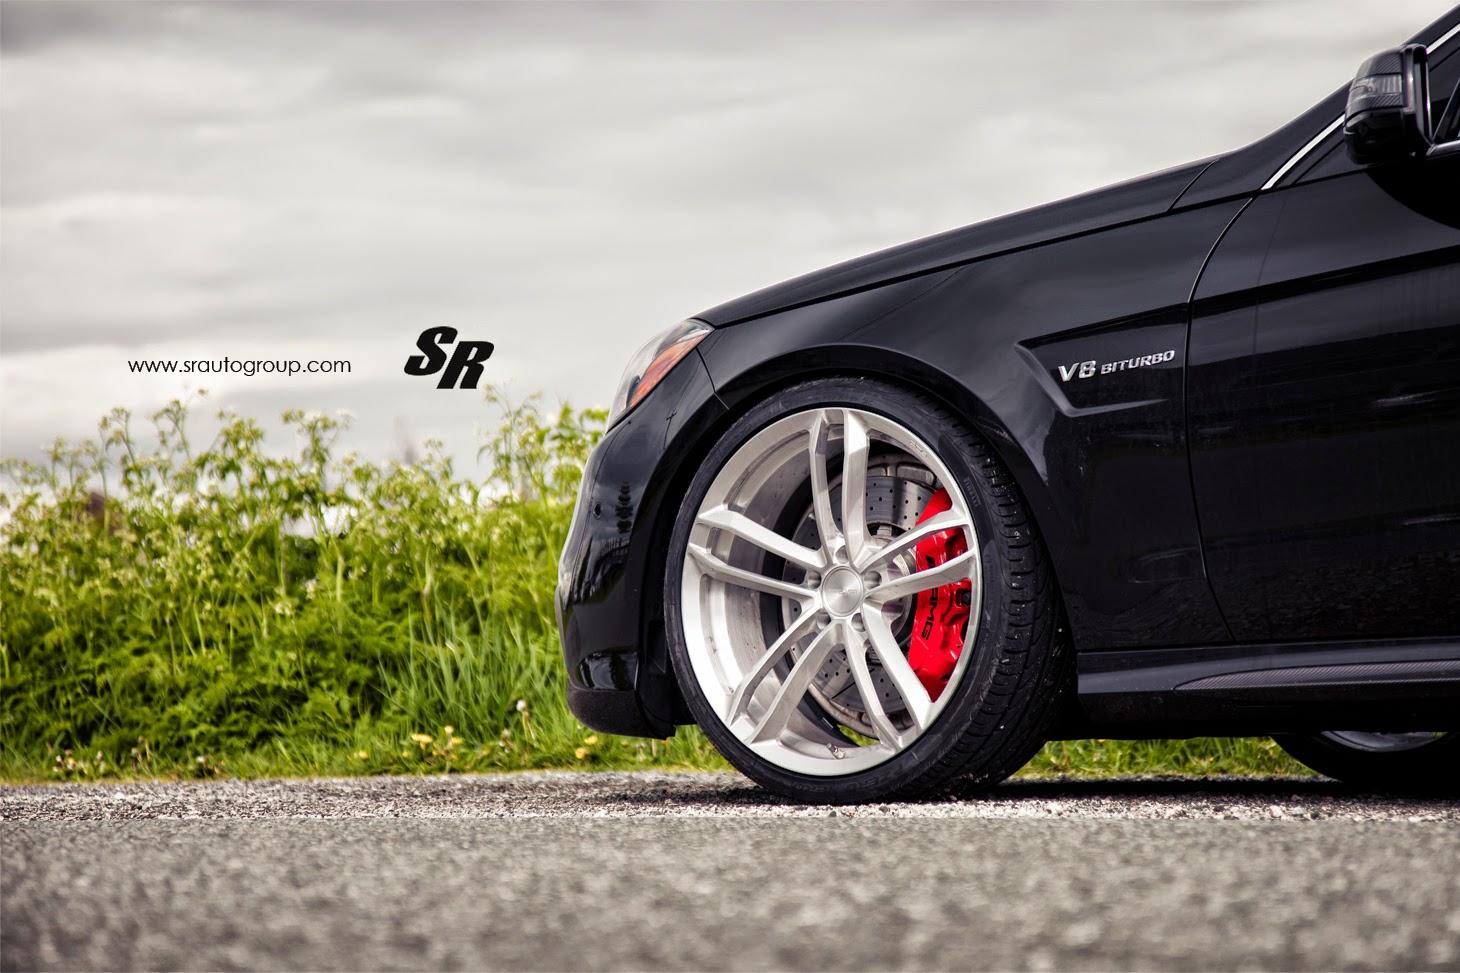 w212 pur wheels